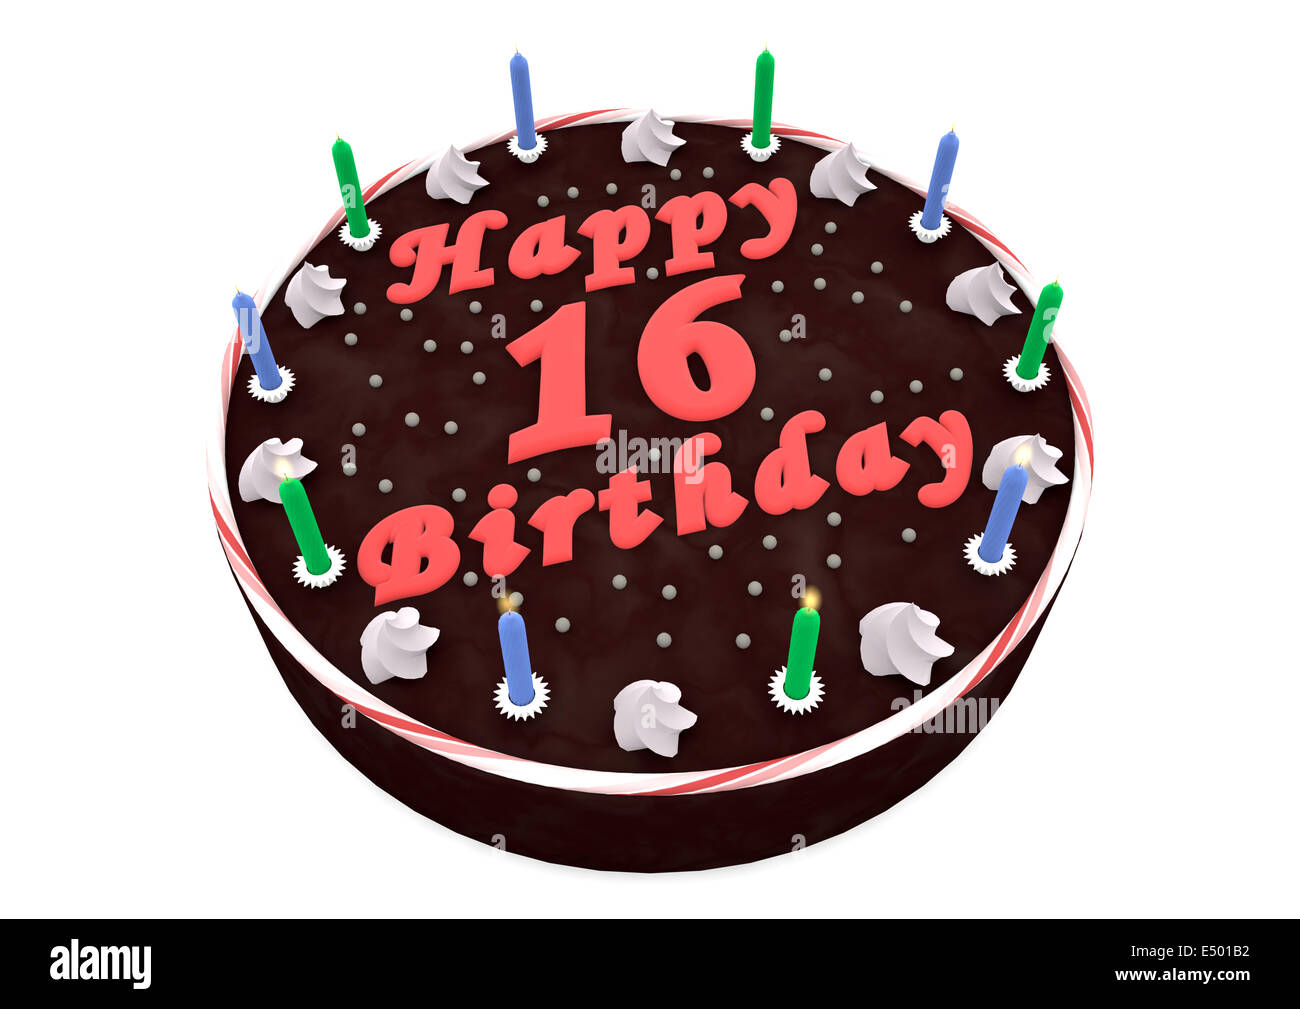 Schokoladenkuchen Fur 16 Geburtstag Stockfoto Bild 71915846 Alamy